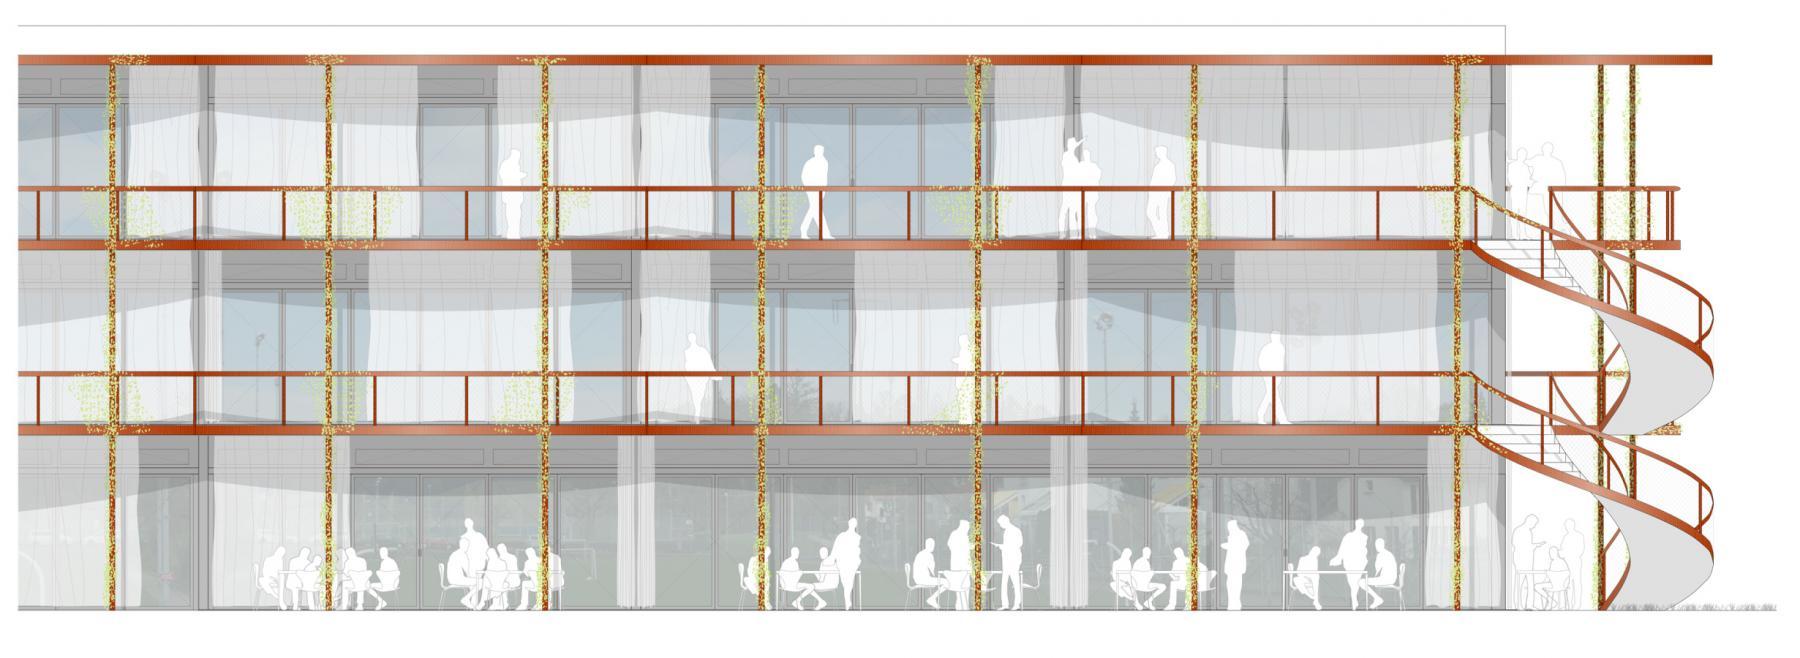 Siegerprojekt Grosser Bär von Schneider Studer Primas, Fassade (Plan: Projektverfassende)